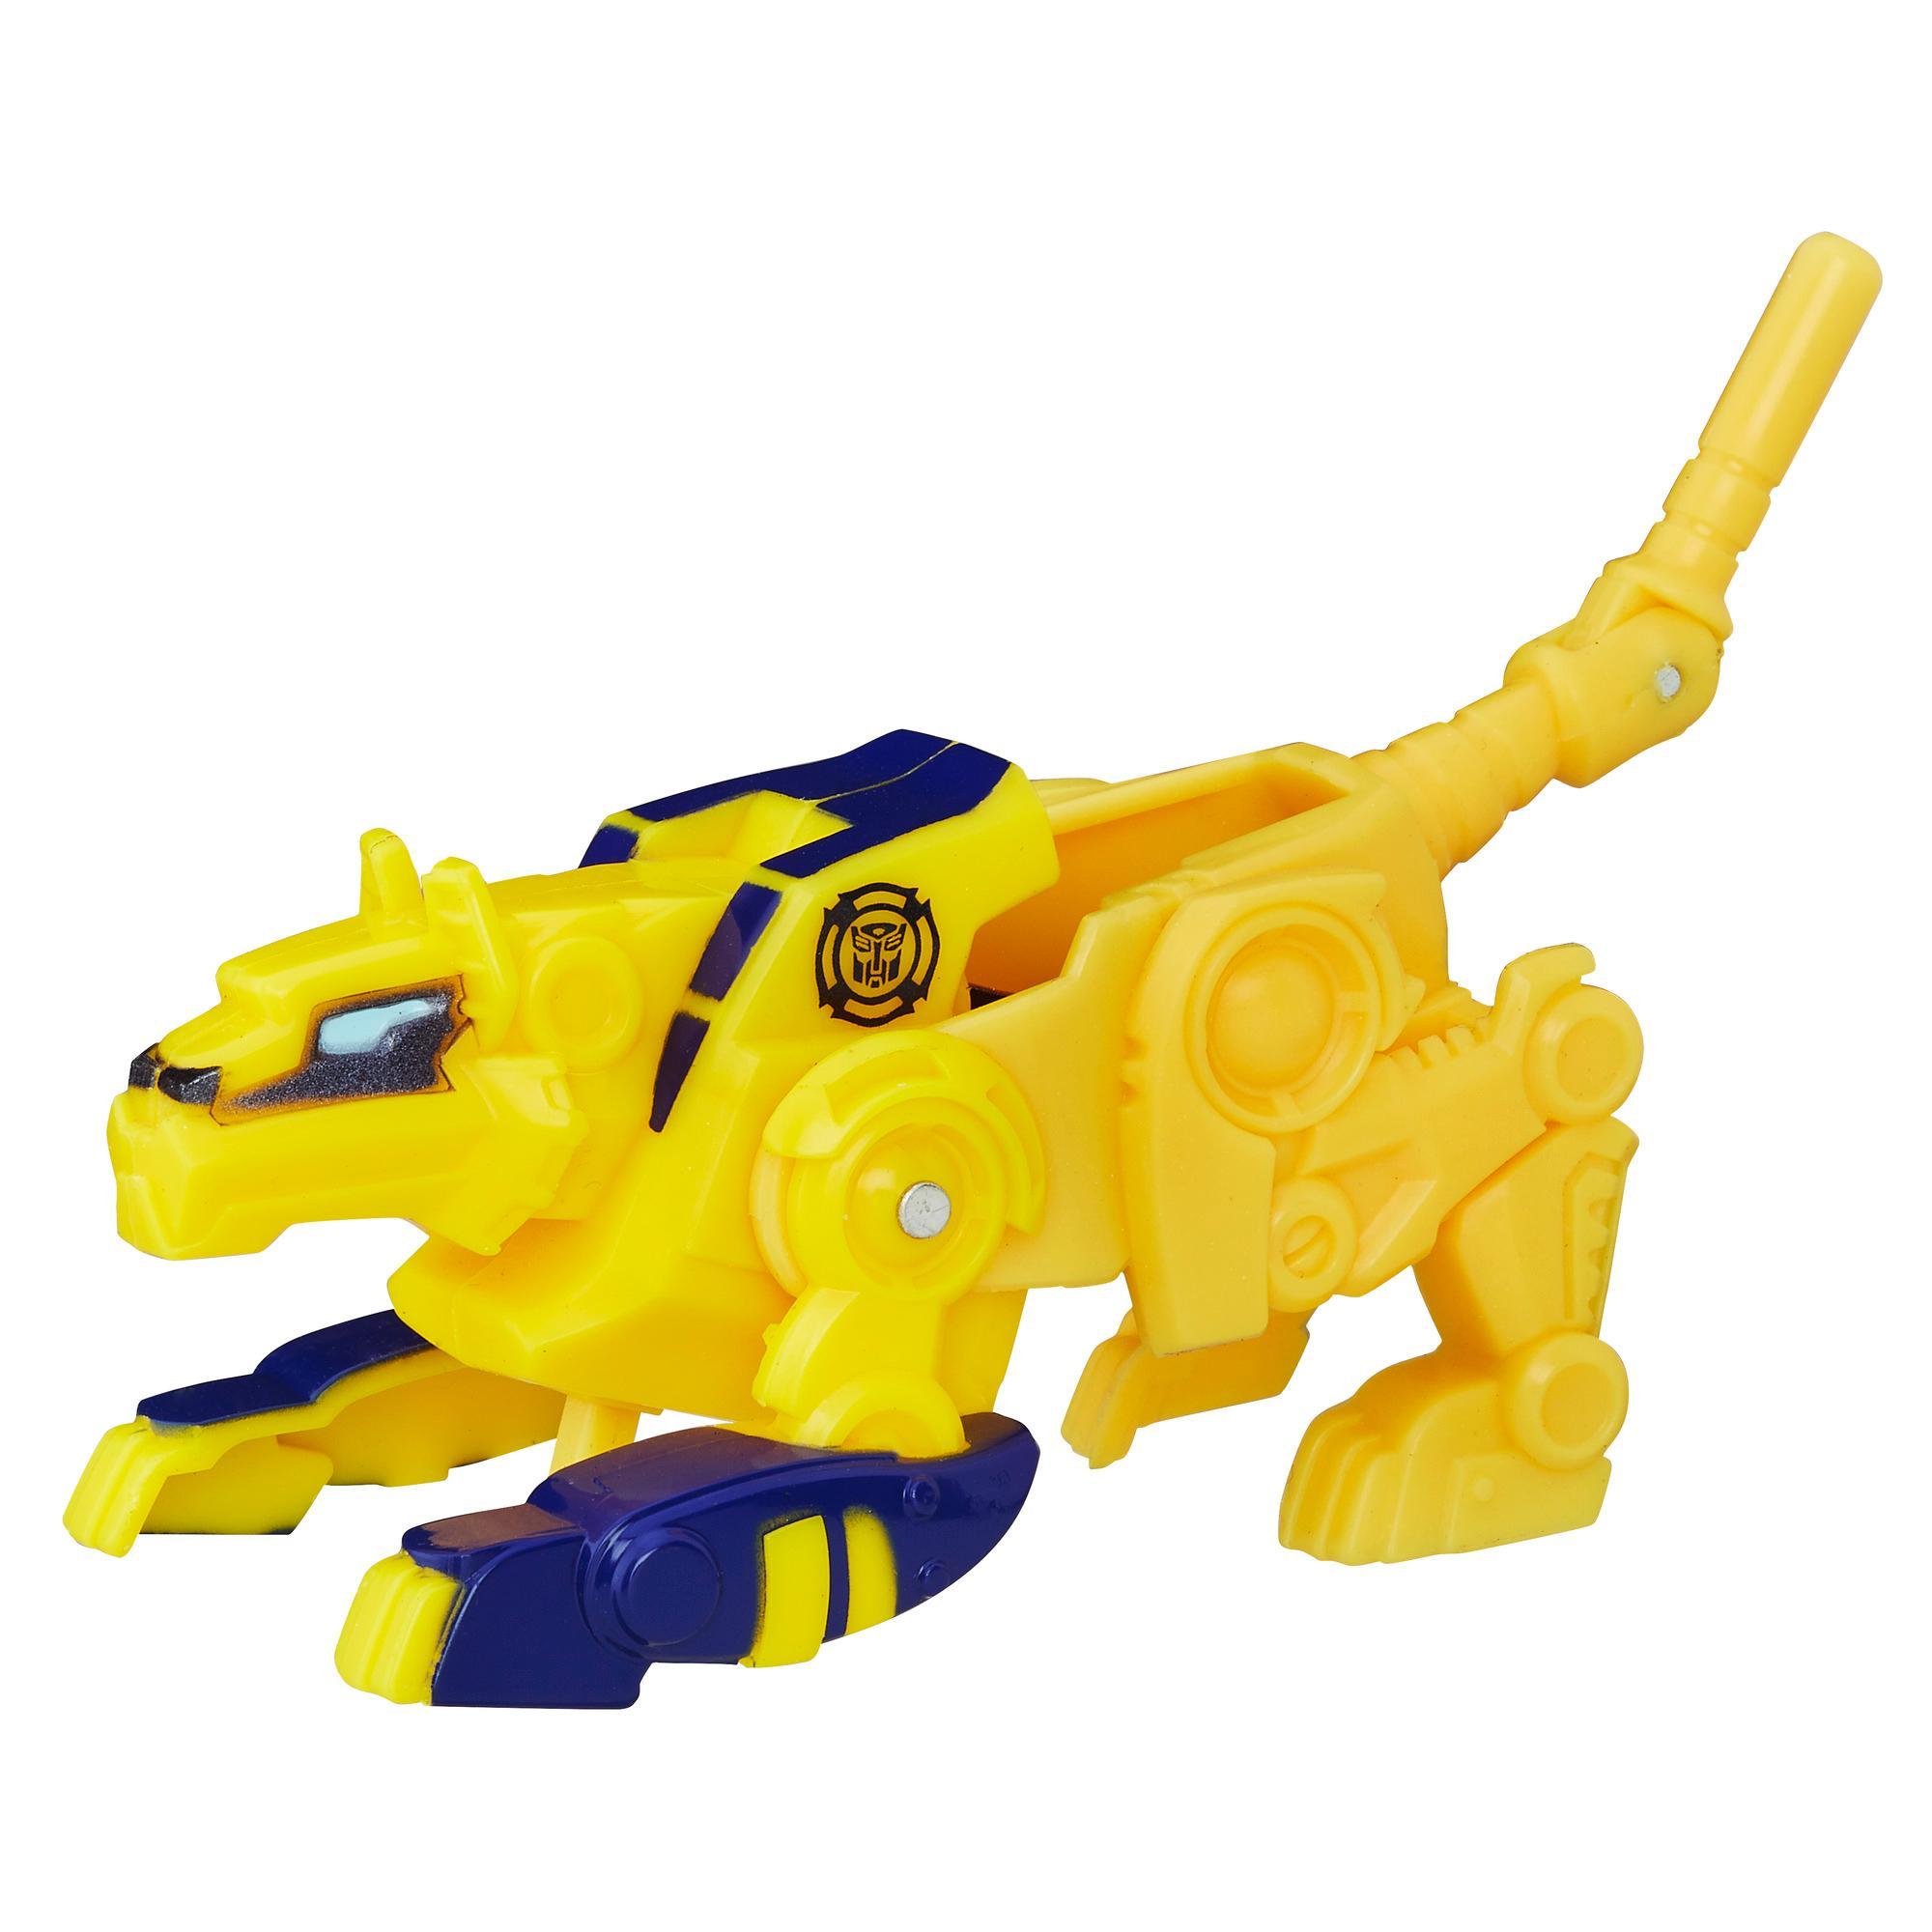 Transformers Rescue Bots Pets Sortido